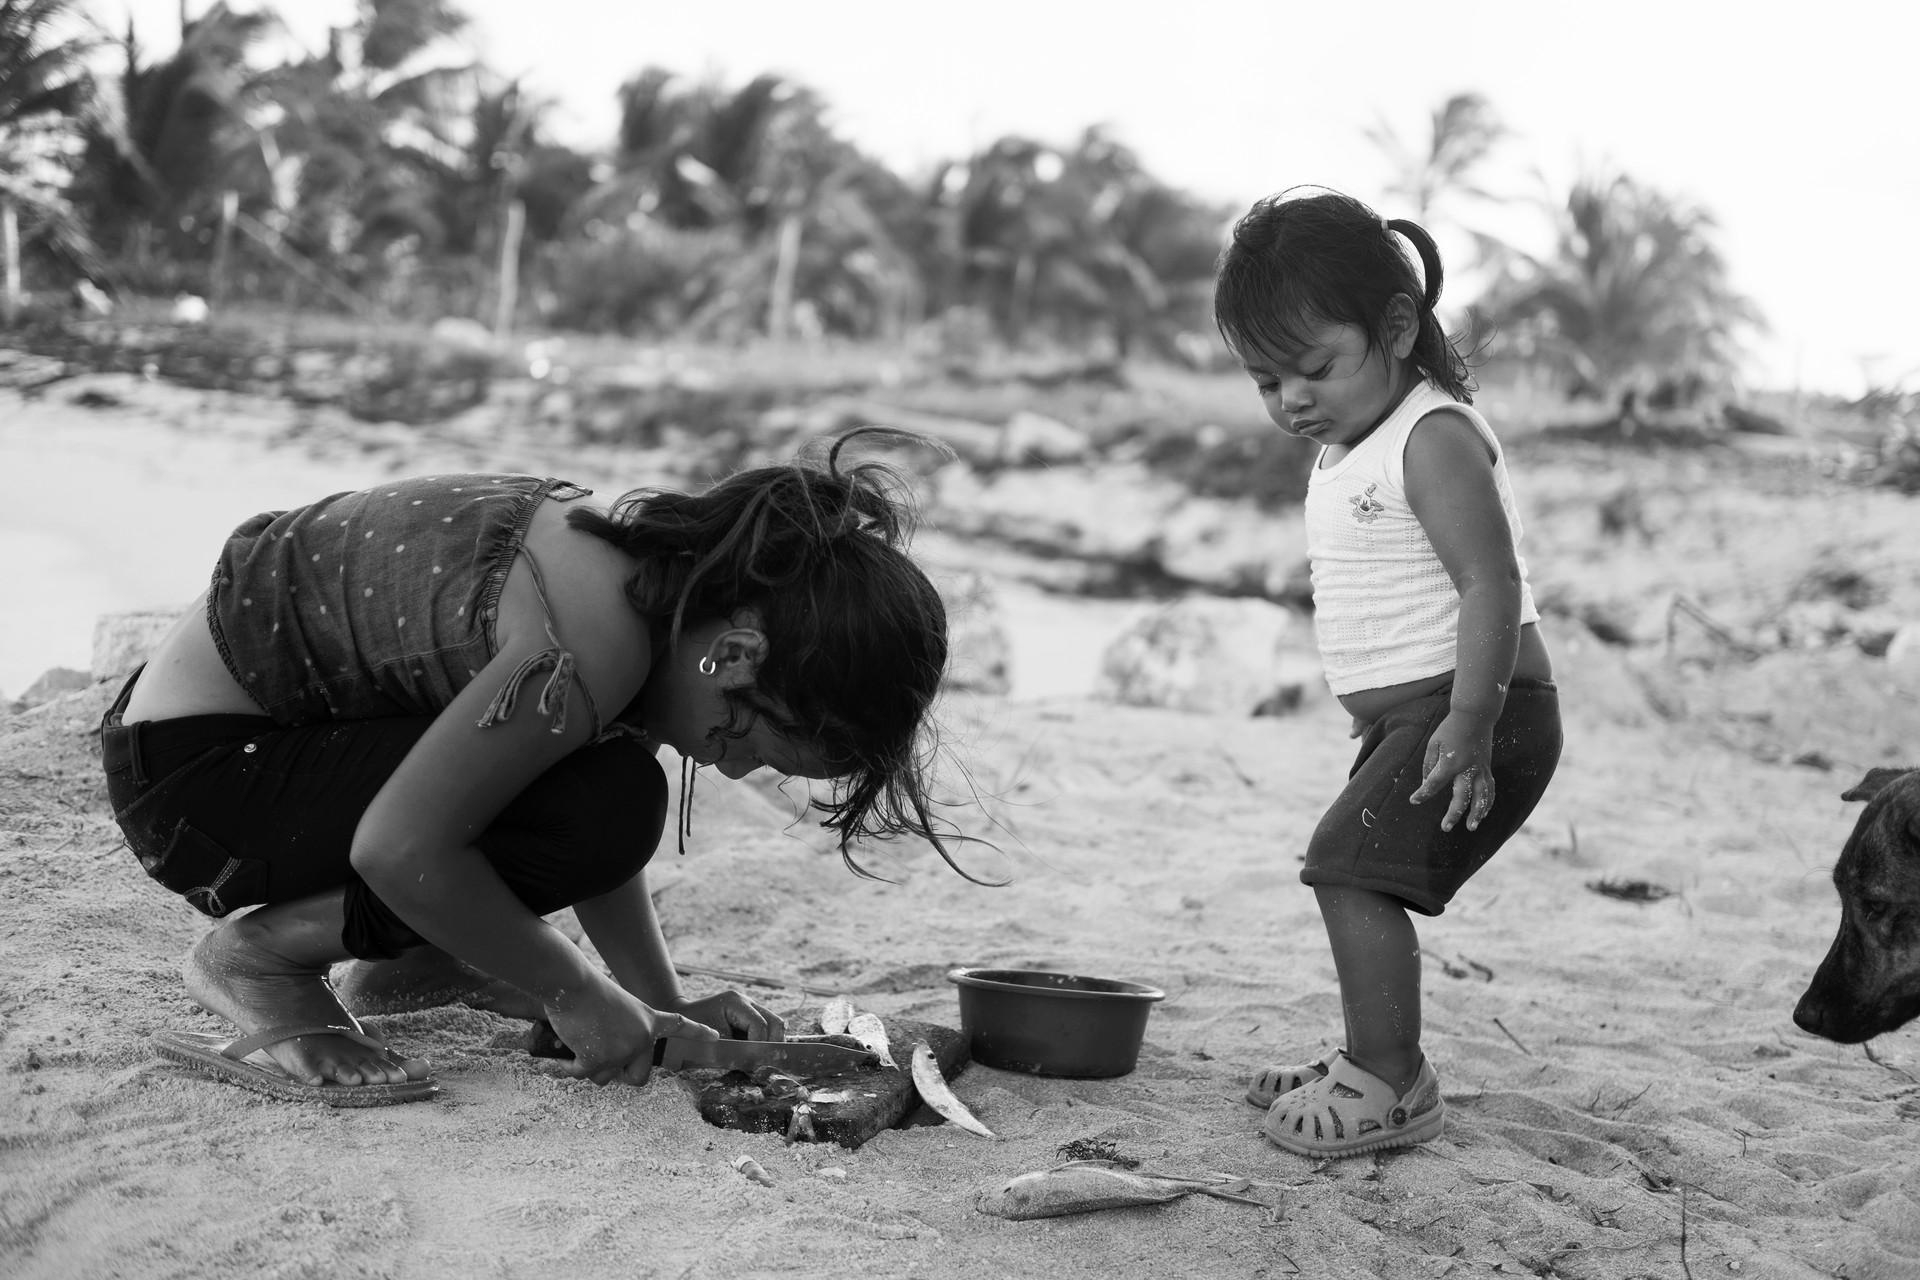 vuong vu photography, seattle, fishing village, Mexico. lifestyle photographer